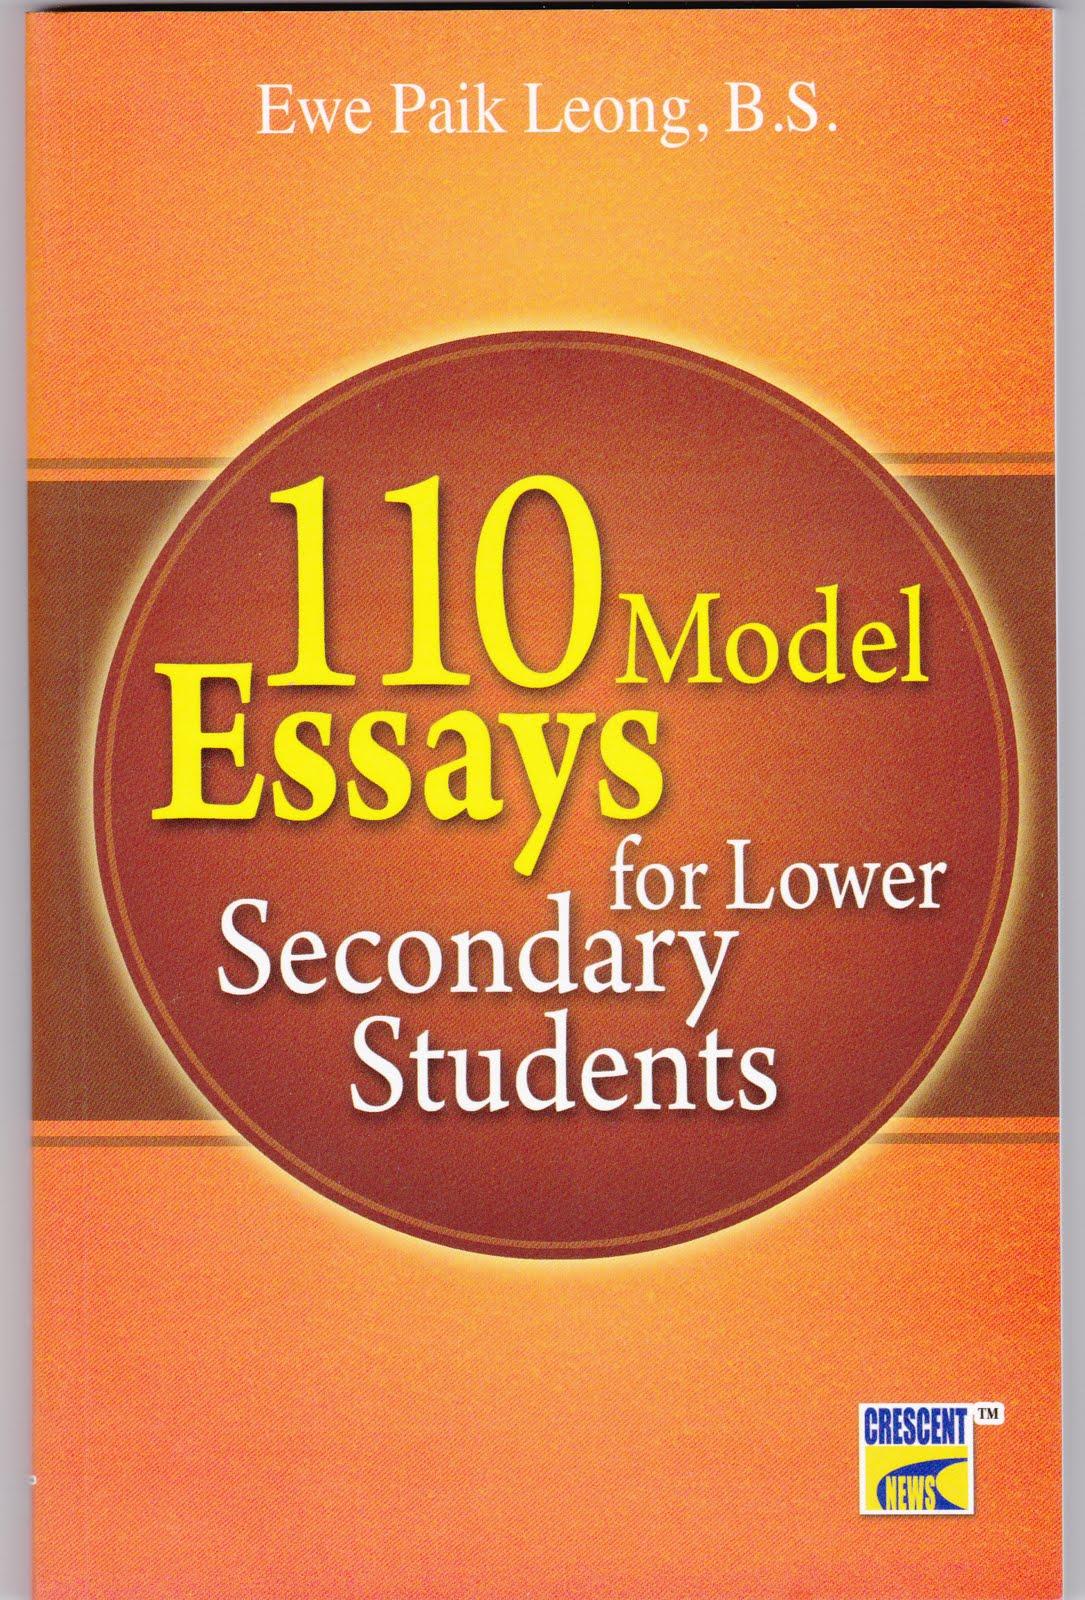 ewe paik leong the wordslinger 110 model essays for lower 110 model essays for lower secondary students just released